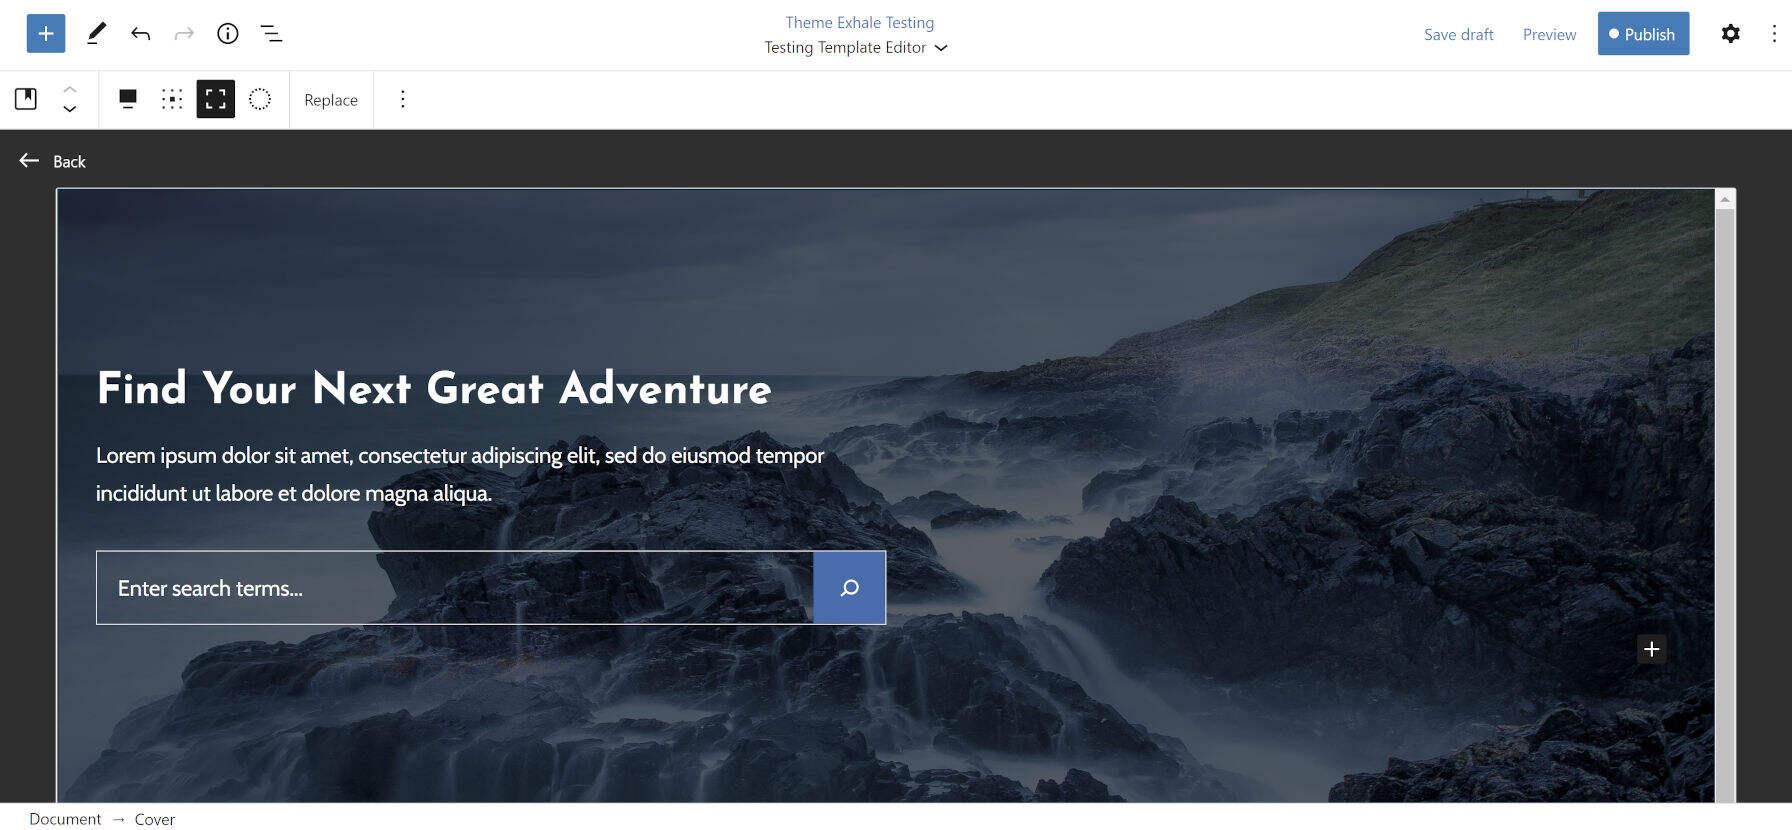 template-editor-custom